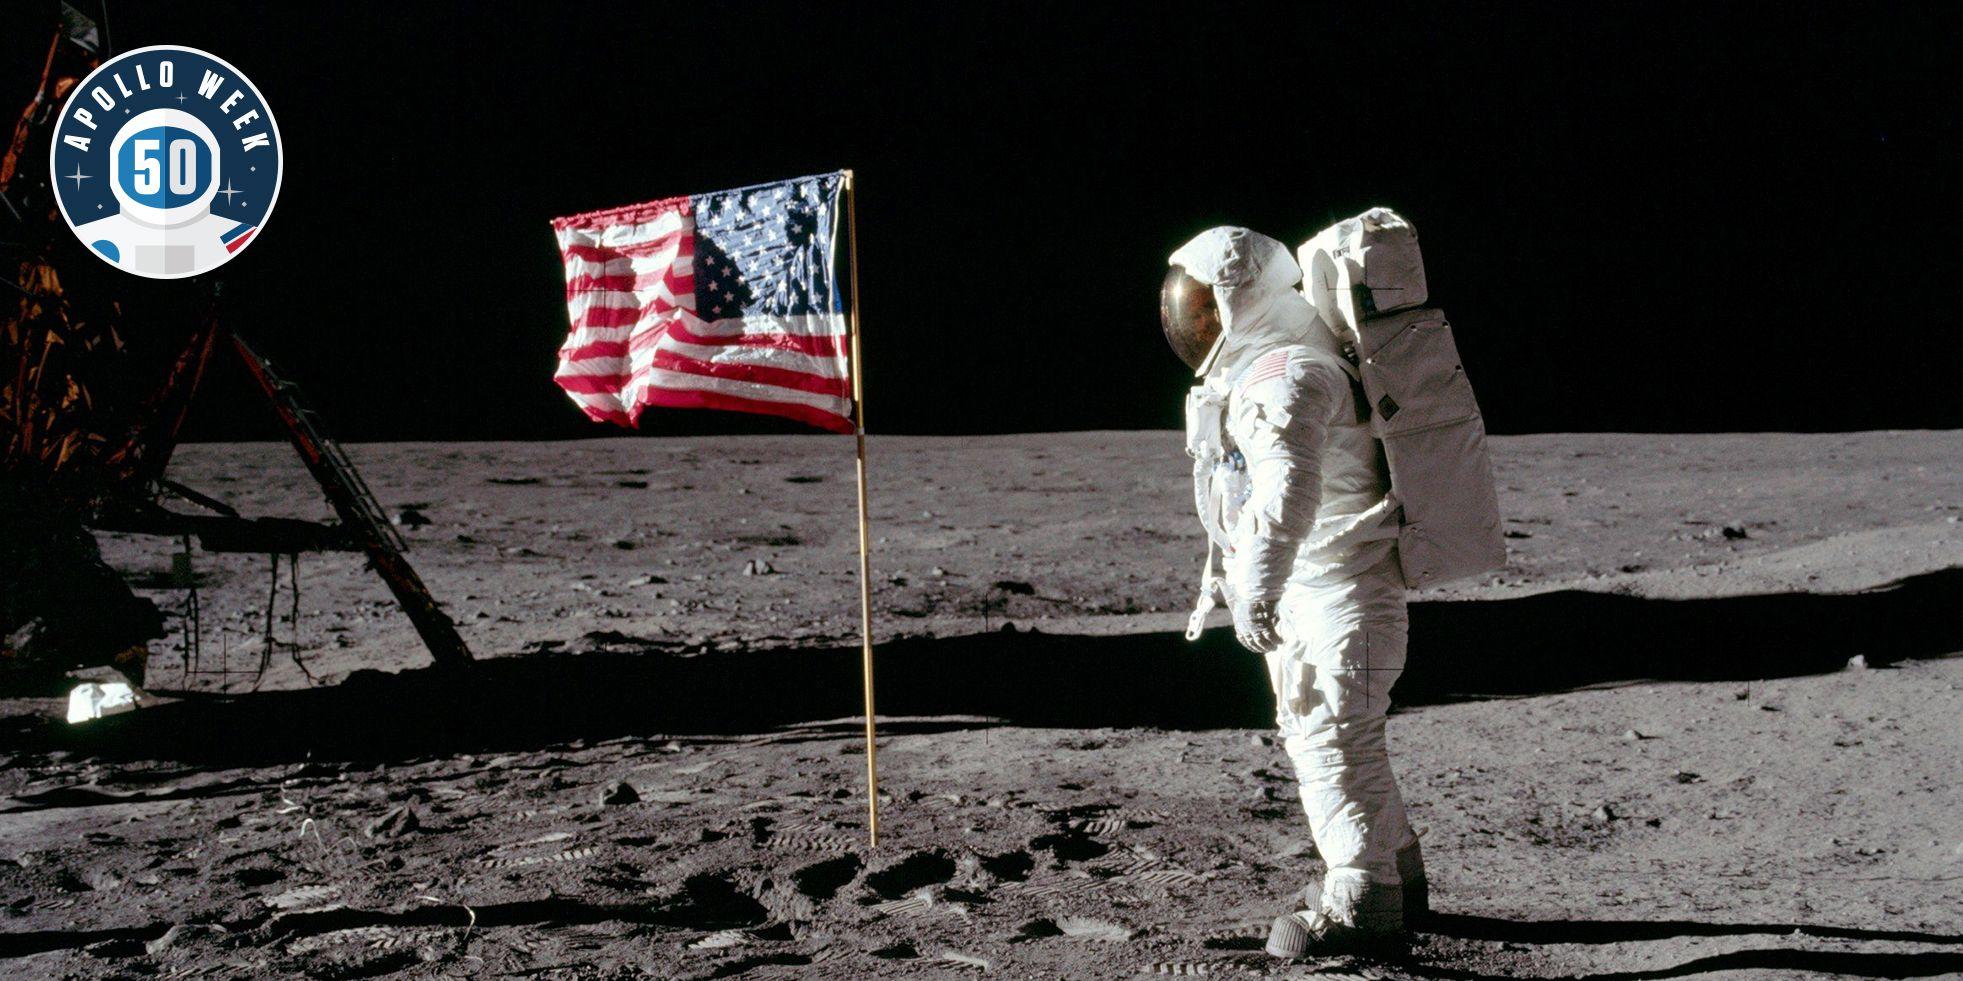 Apollo 11 Moon Landing | History of NASA's Apollo 11 Mission